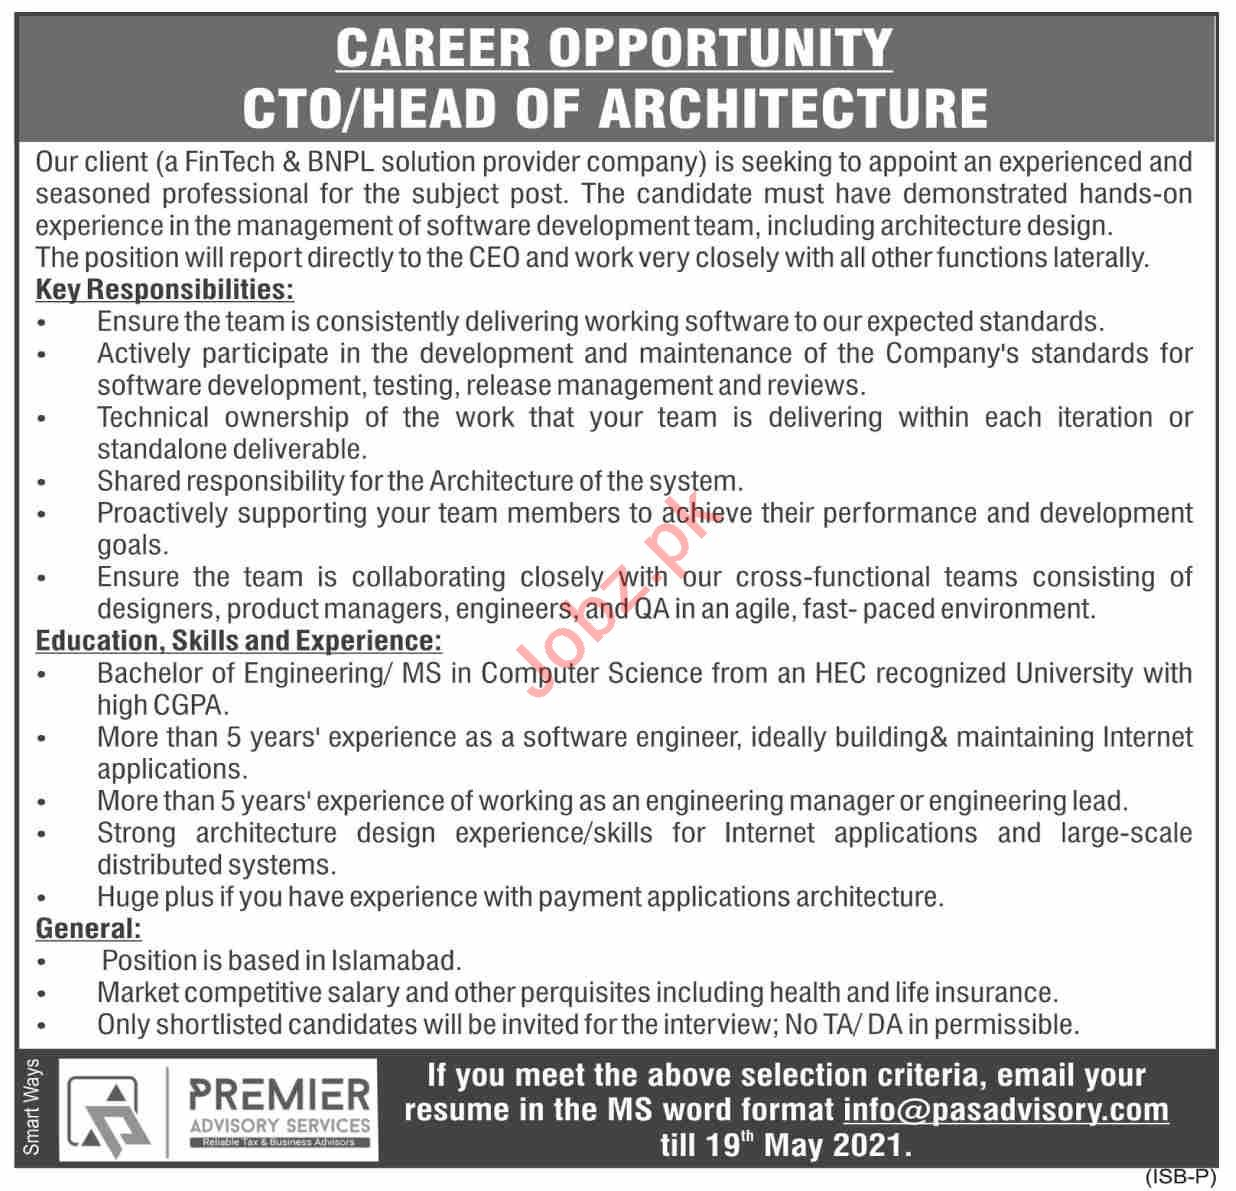 Premier Advisory Services Islamabad Jobs 2021 for CTO